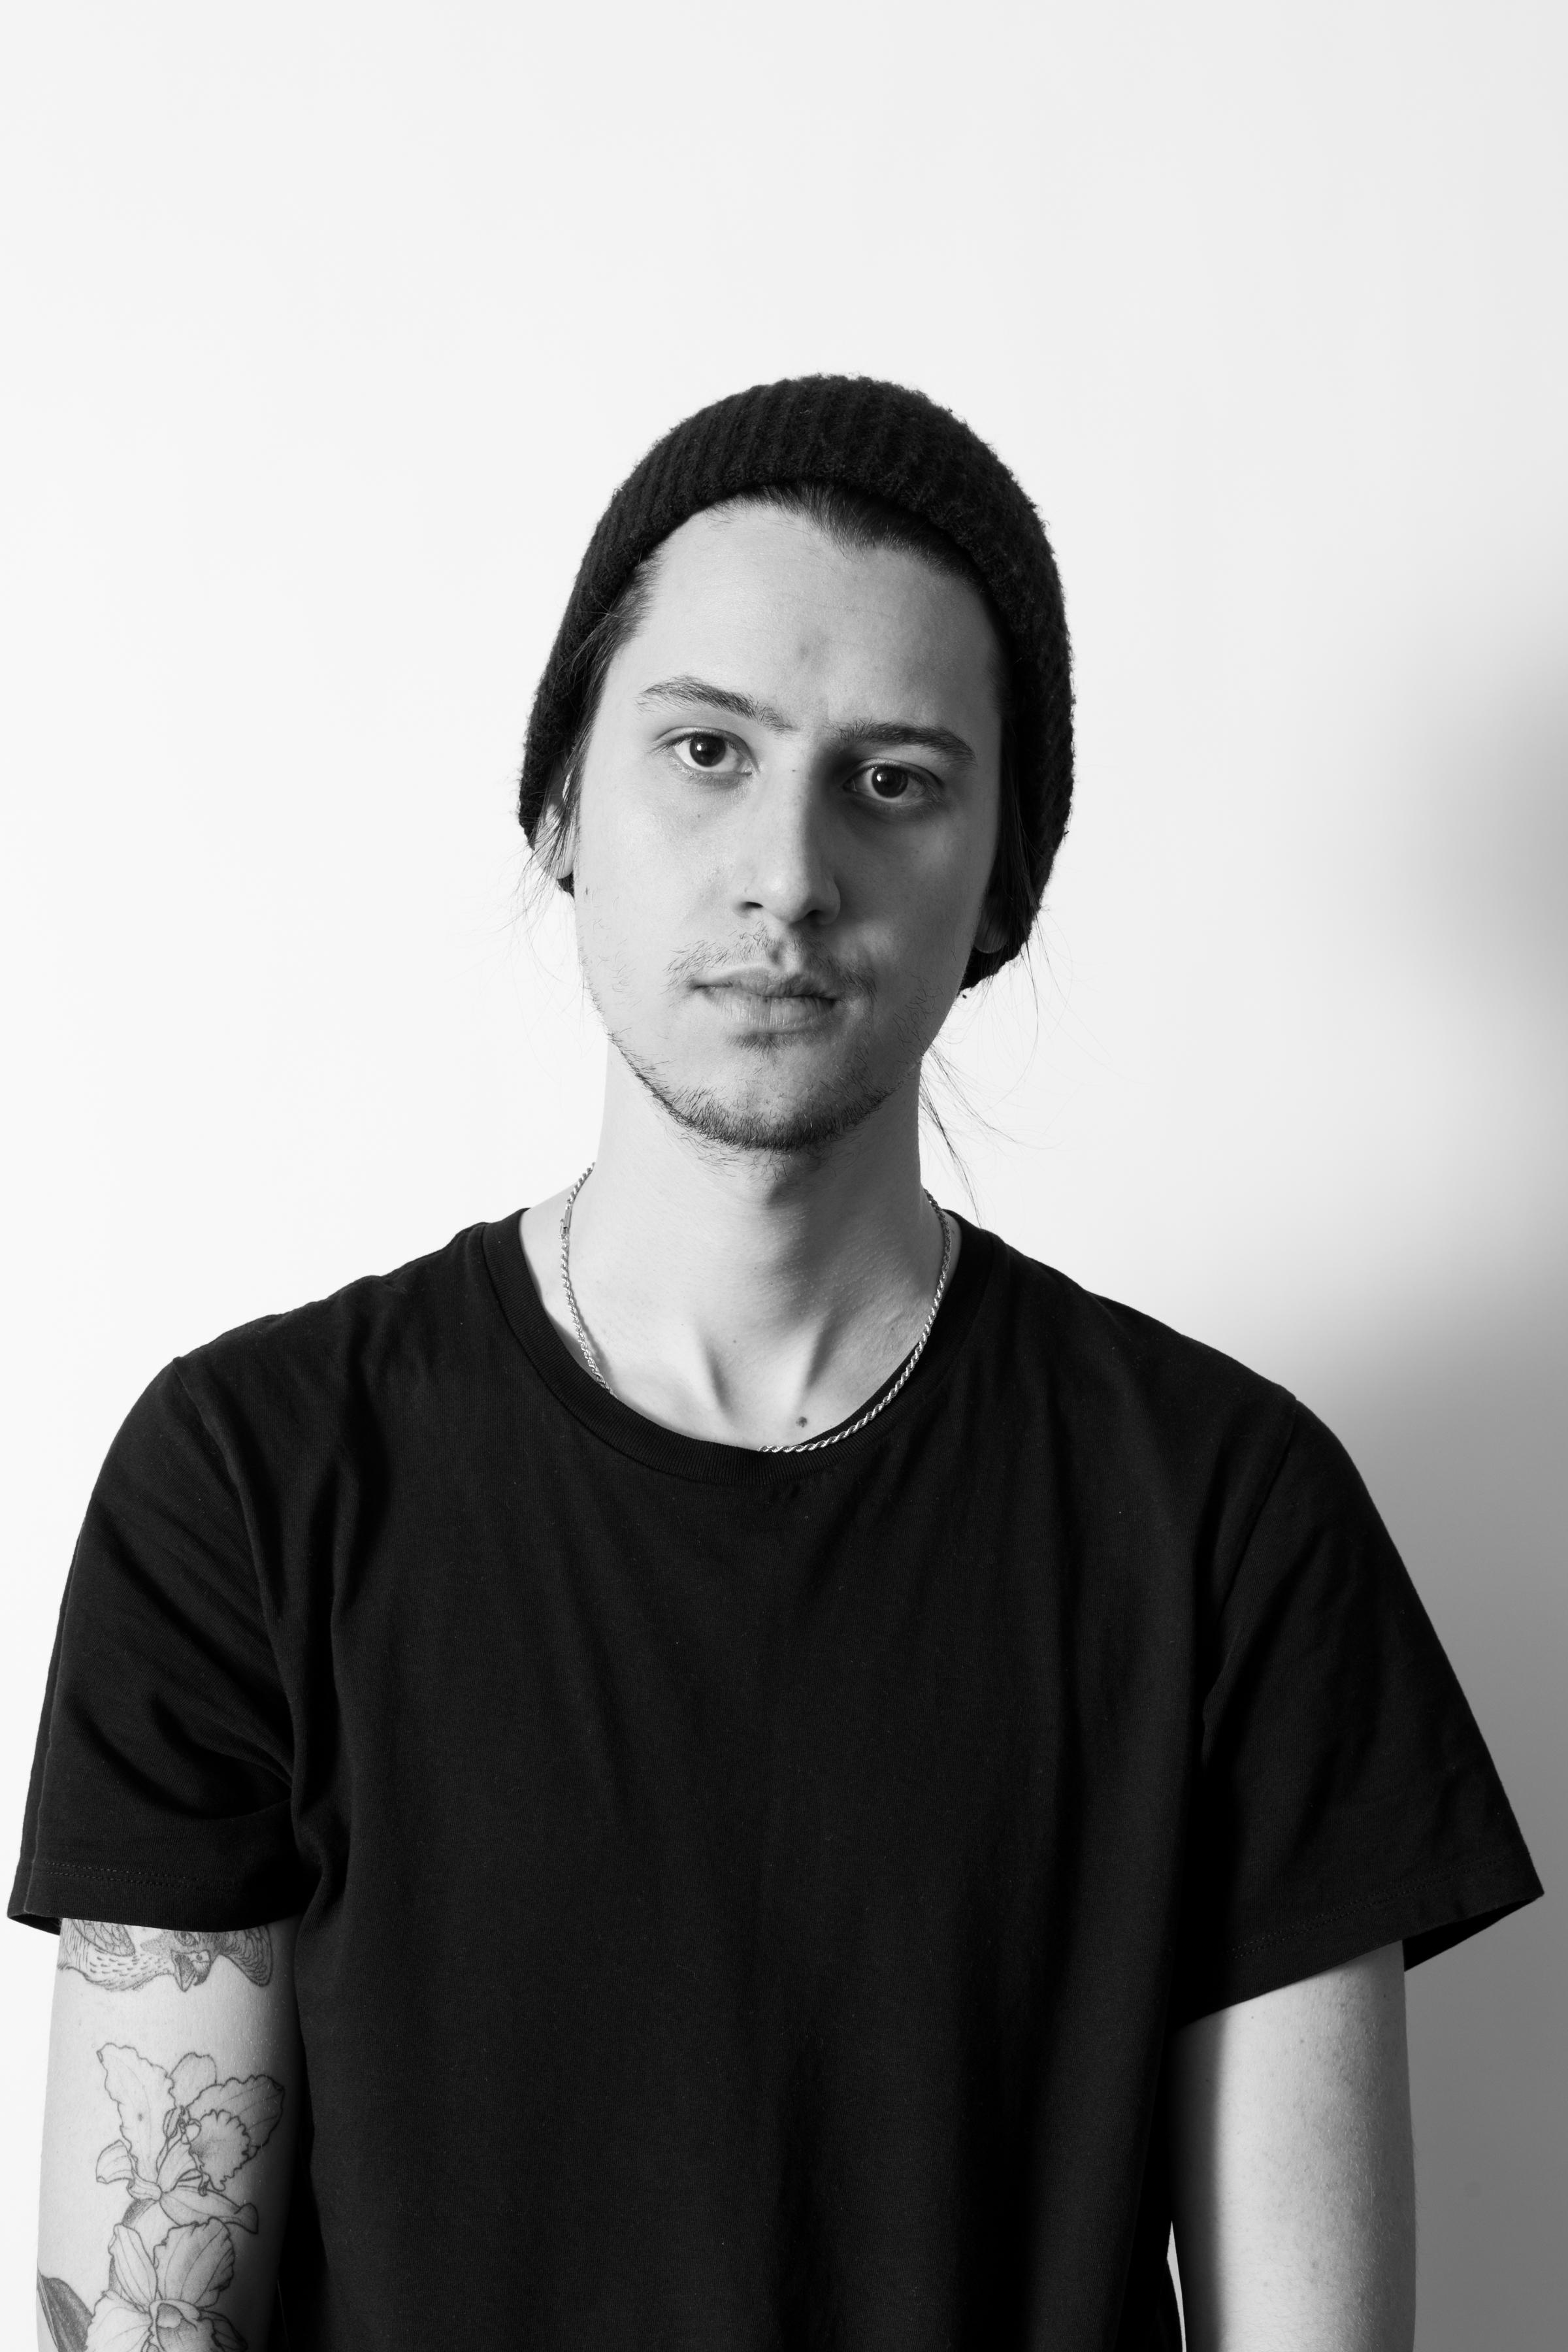 Tristan Oliveira